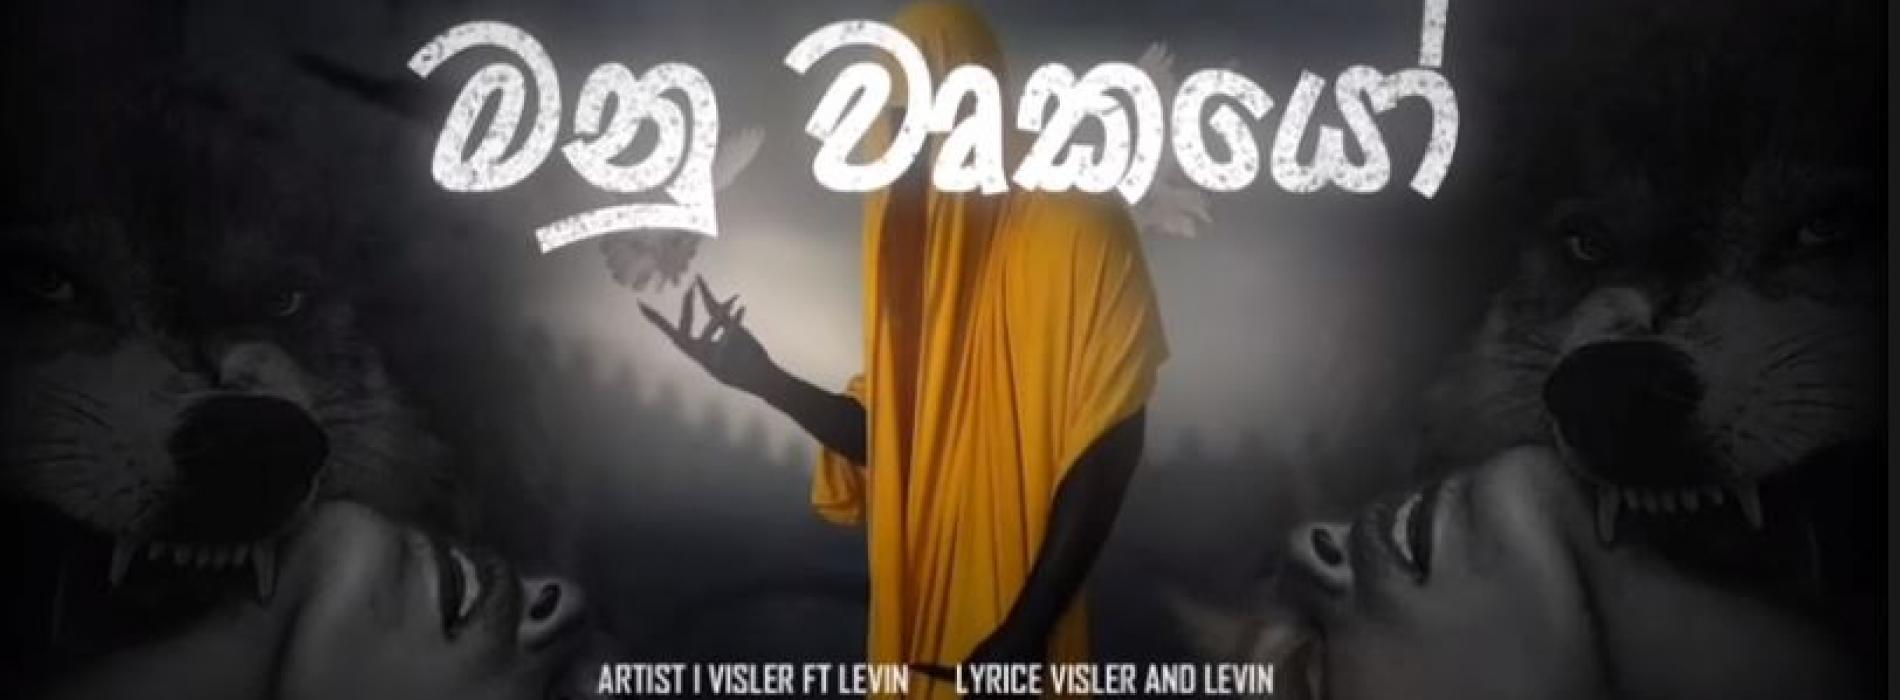 New Music : Visler – මනු වෘකයෝ (Manu Wrukayo) ft Levin (Official Audio)